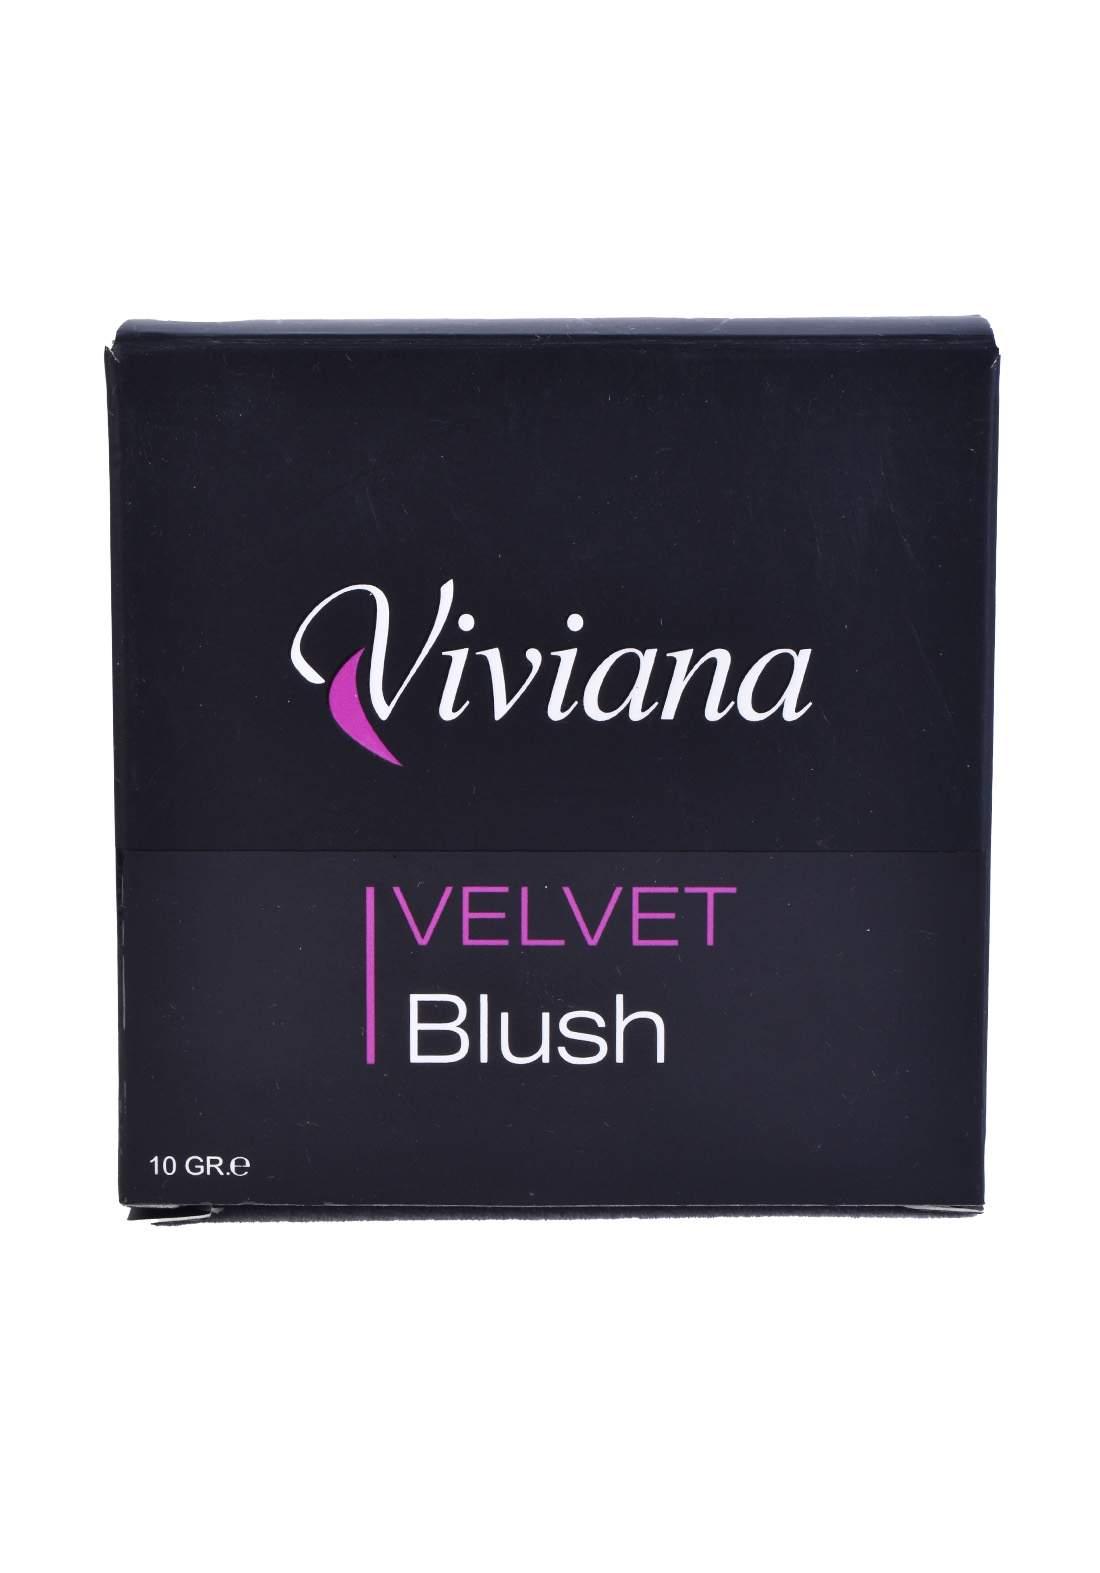 Viviana Velvet Blush No.02 10g احمر خدود